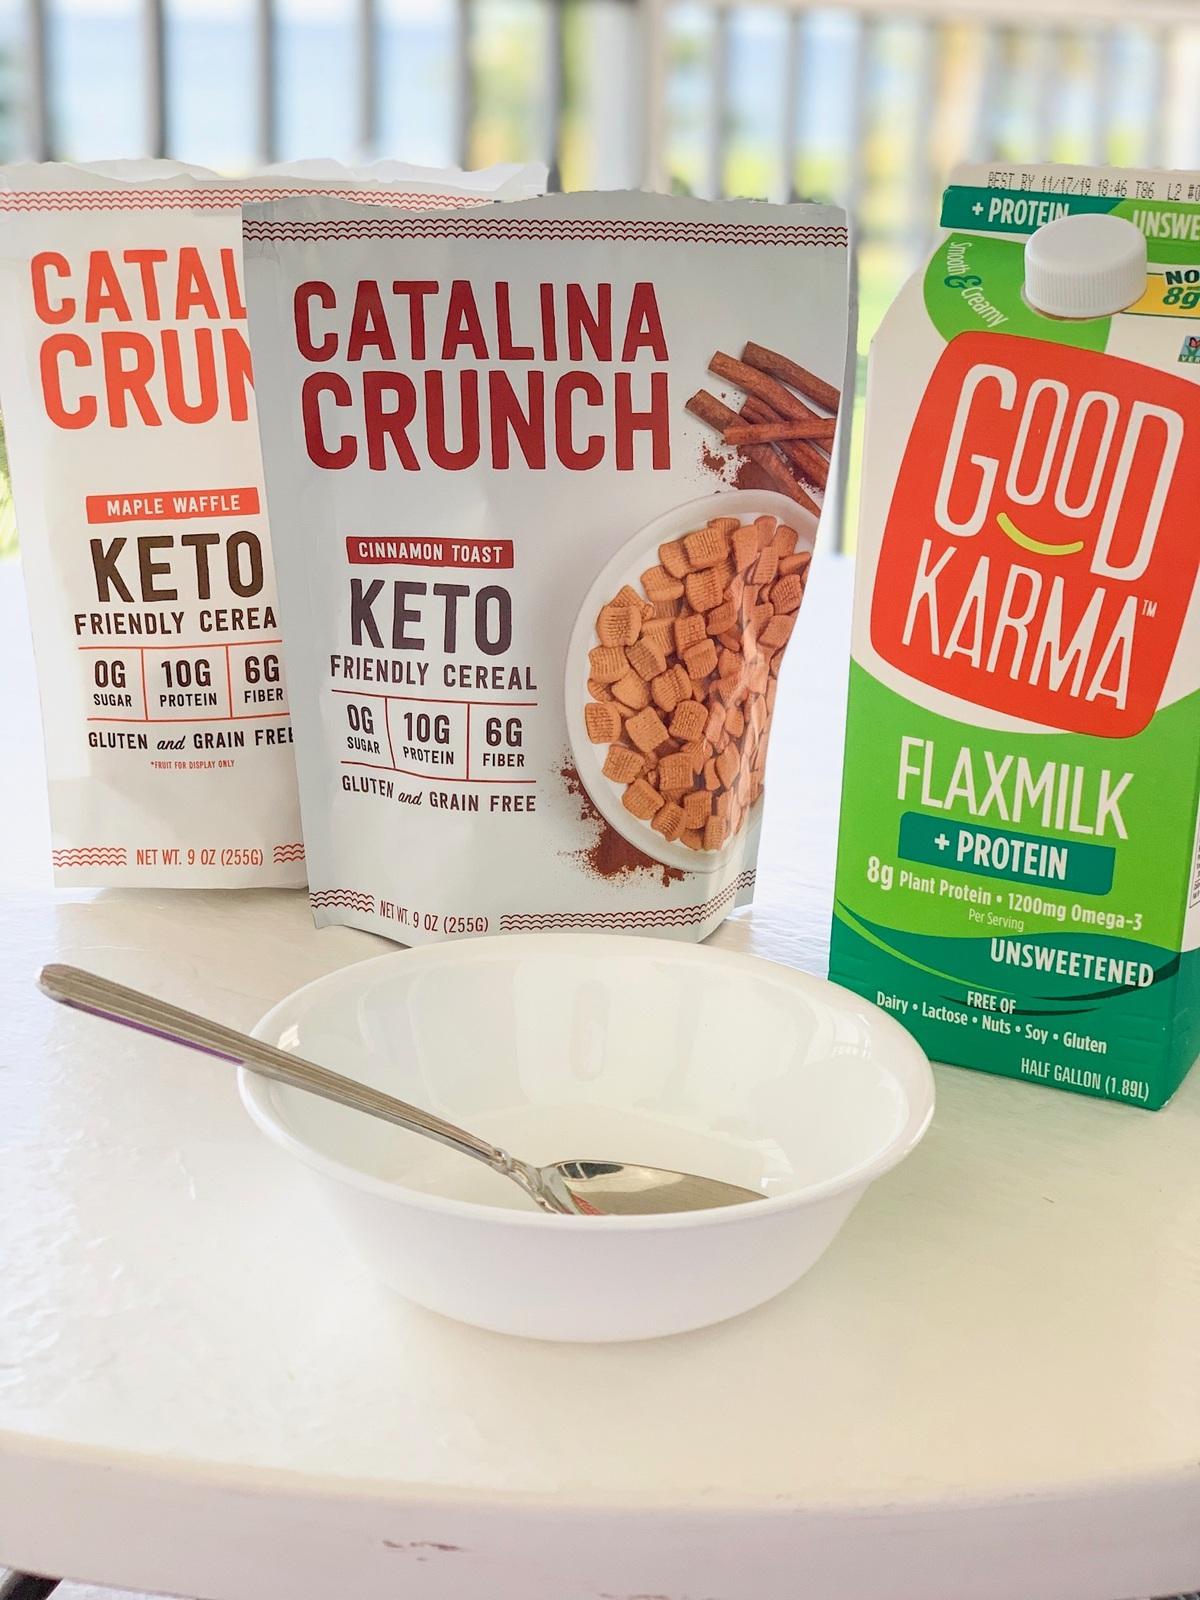 catalina crunch cereal on a table with good karma flaxmilk